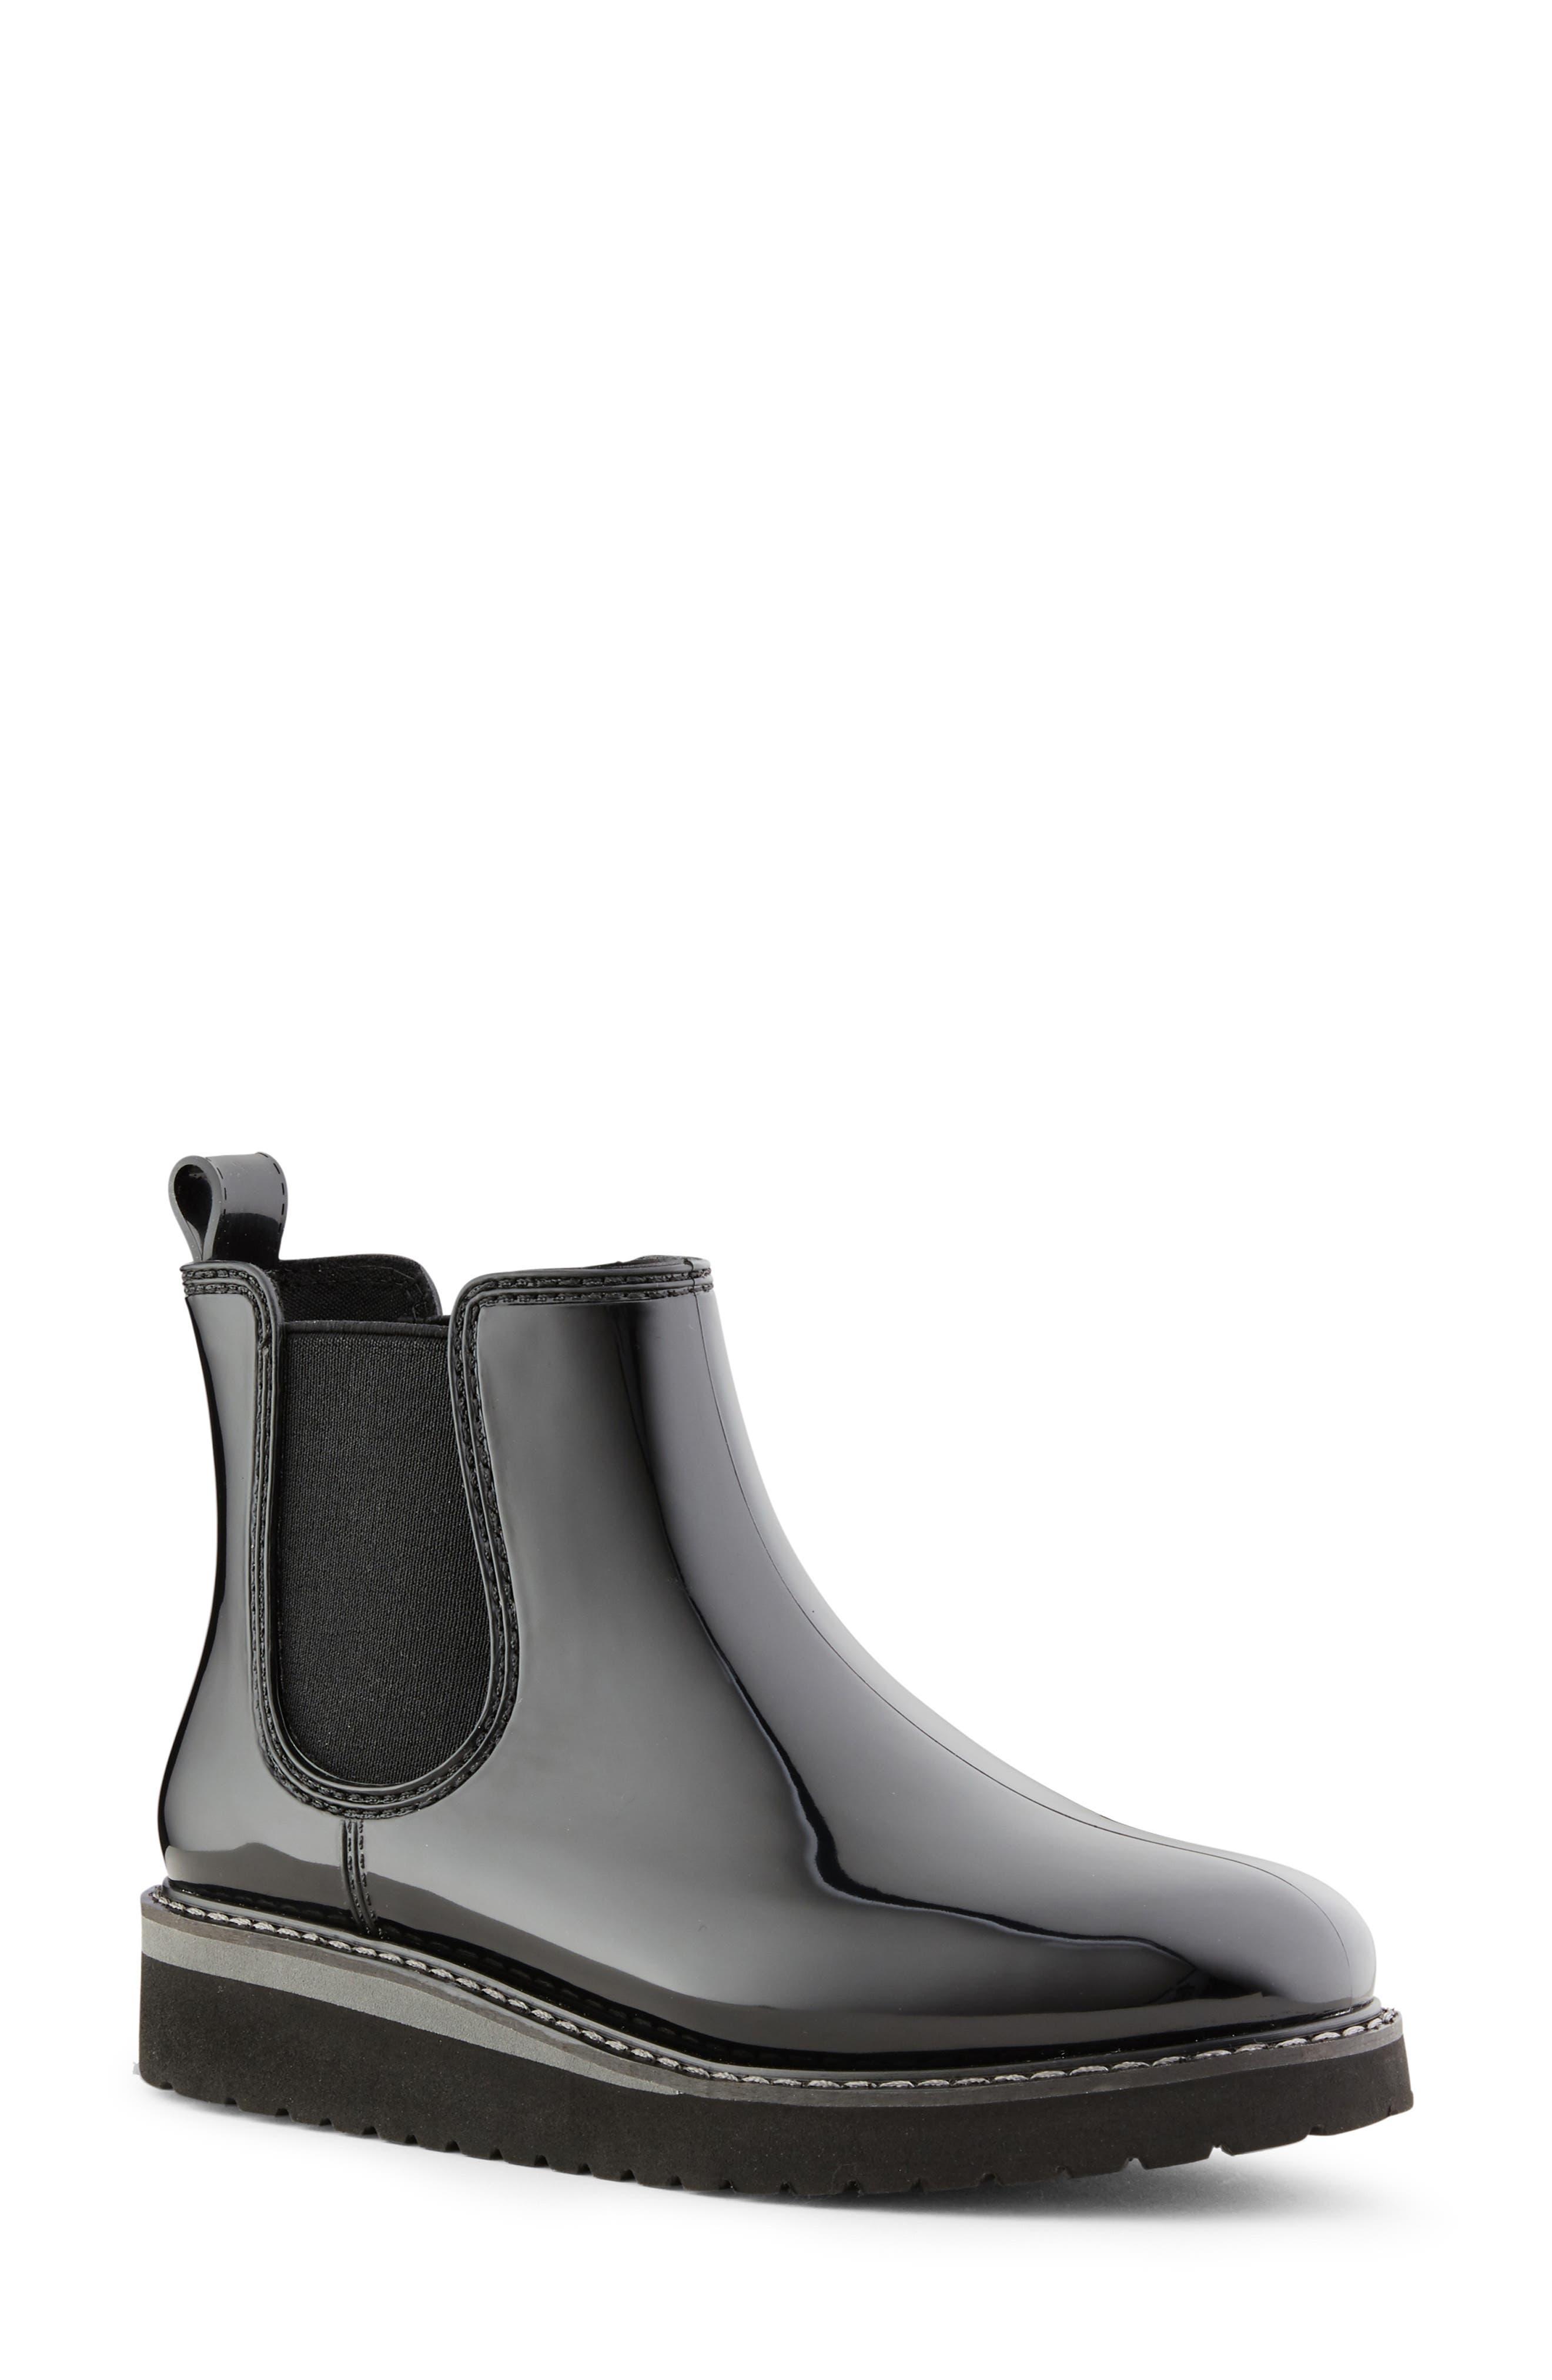 COUGAR, Kensington Chelsea Rain Boot, Main thumbnail 1, color, BLACK/ CHARCOAL